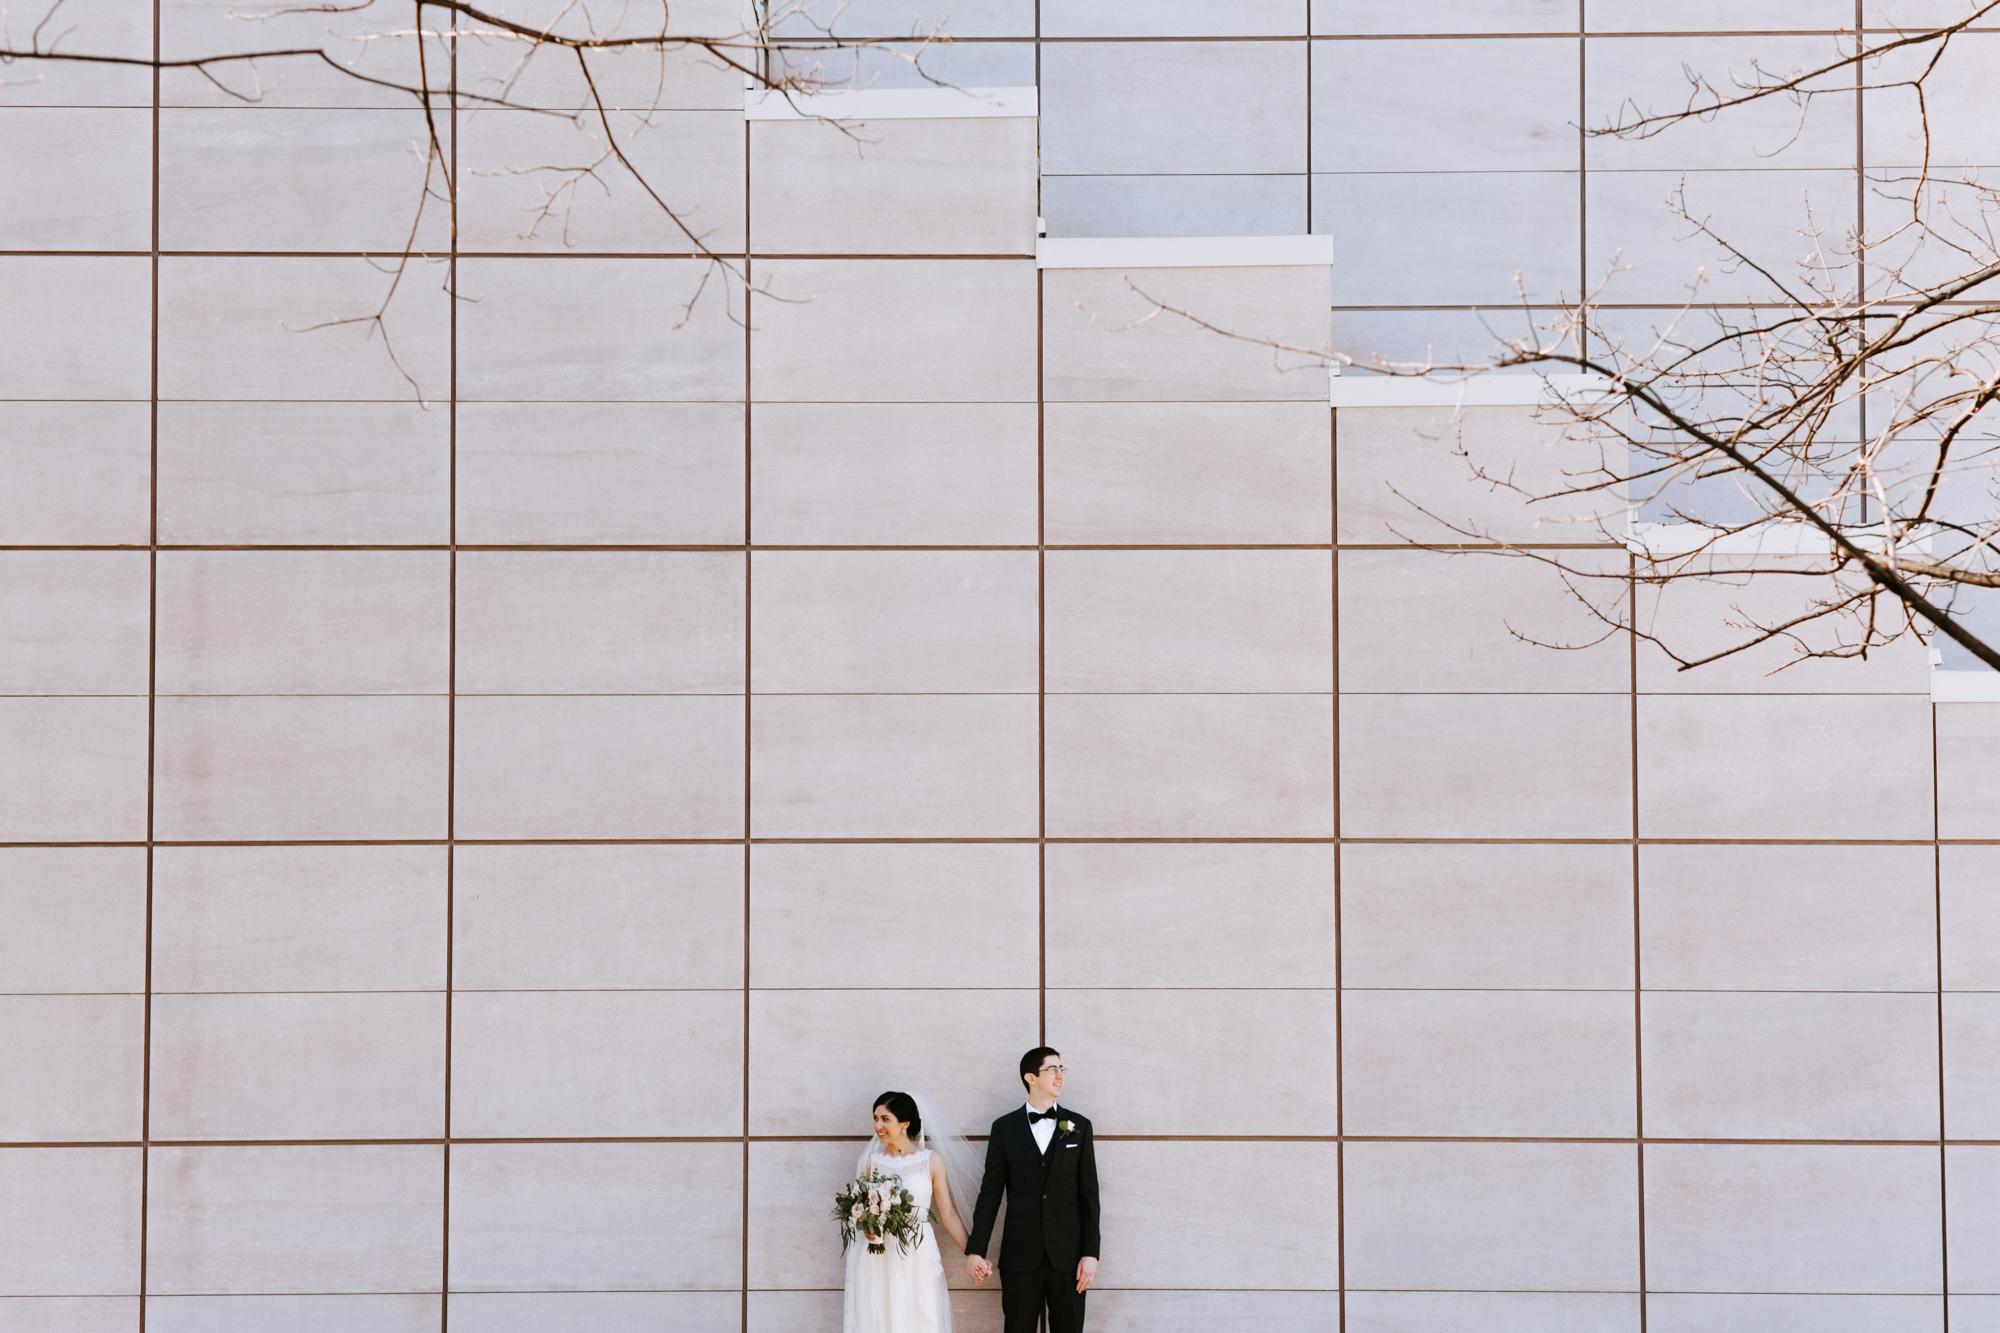 Texture Photo_Baker_Knoxville Wedding Photographer-11.jpg